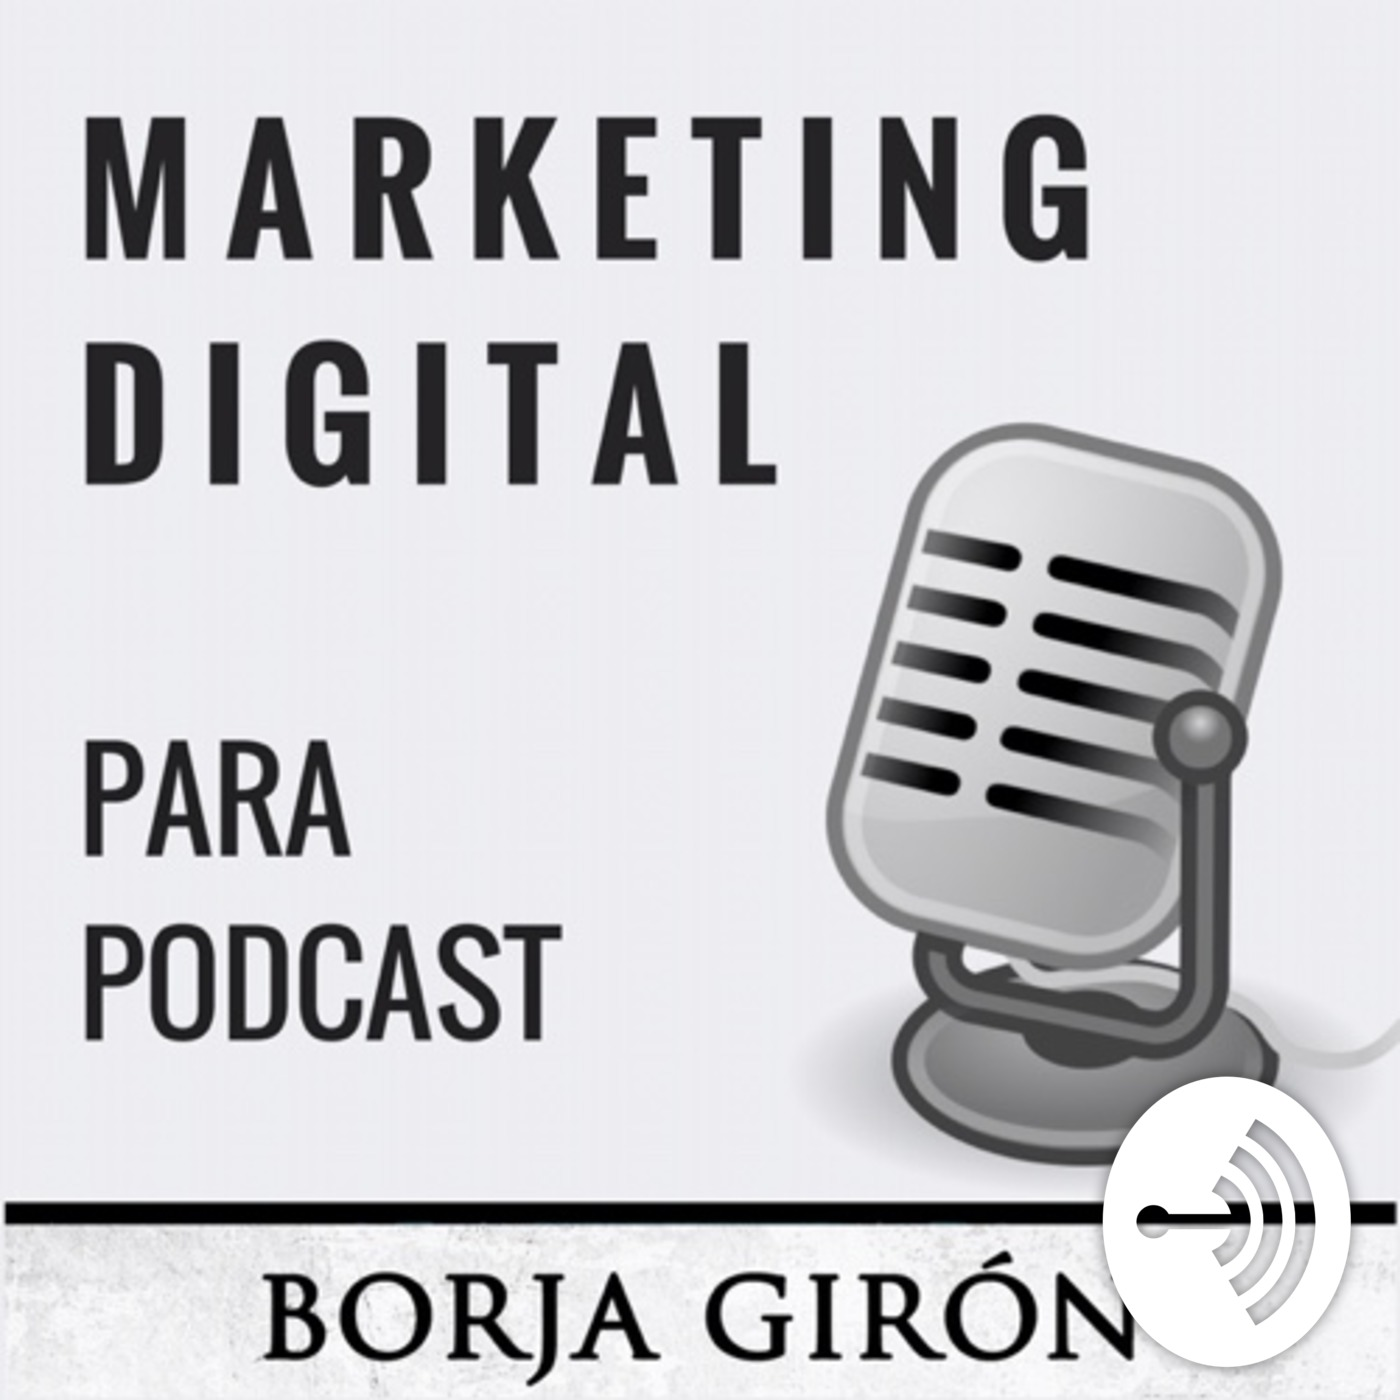 Marketing online para podcast